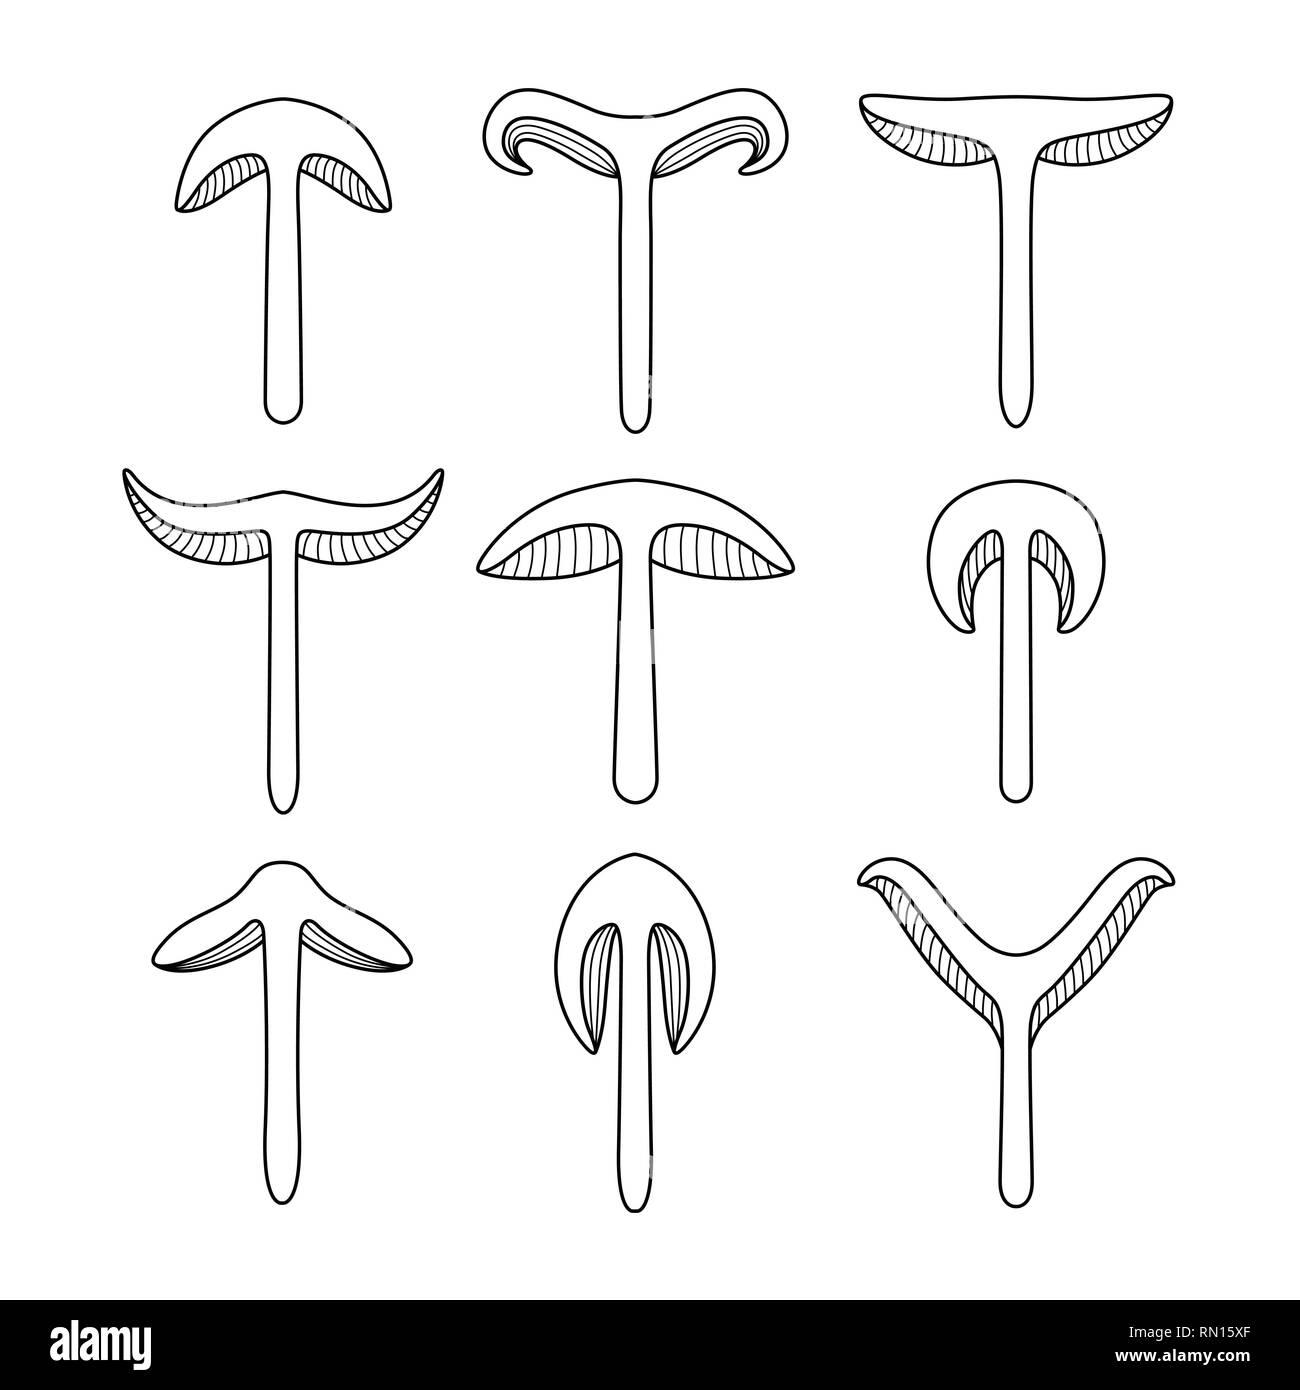 Mushroom Silhouettes Set. Black Line Drawing Vector. Sliced Toadstool - Stock Image